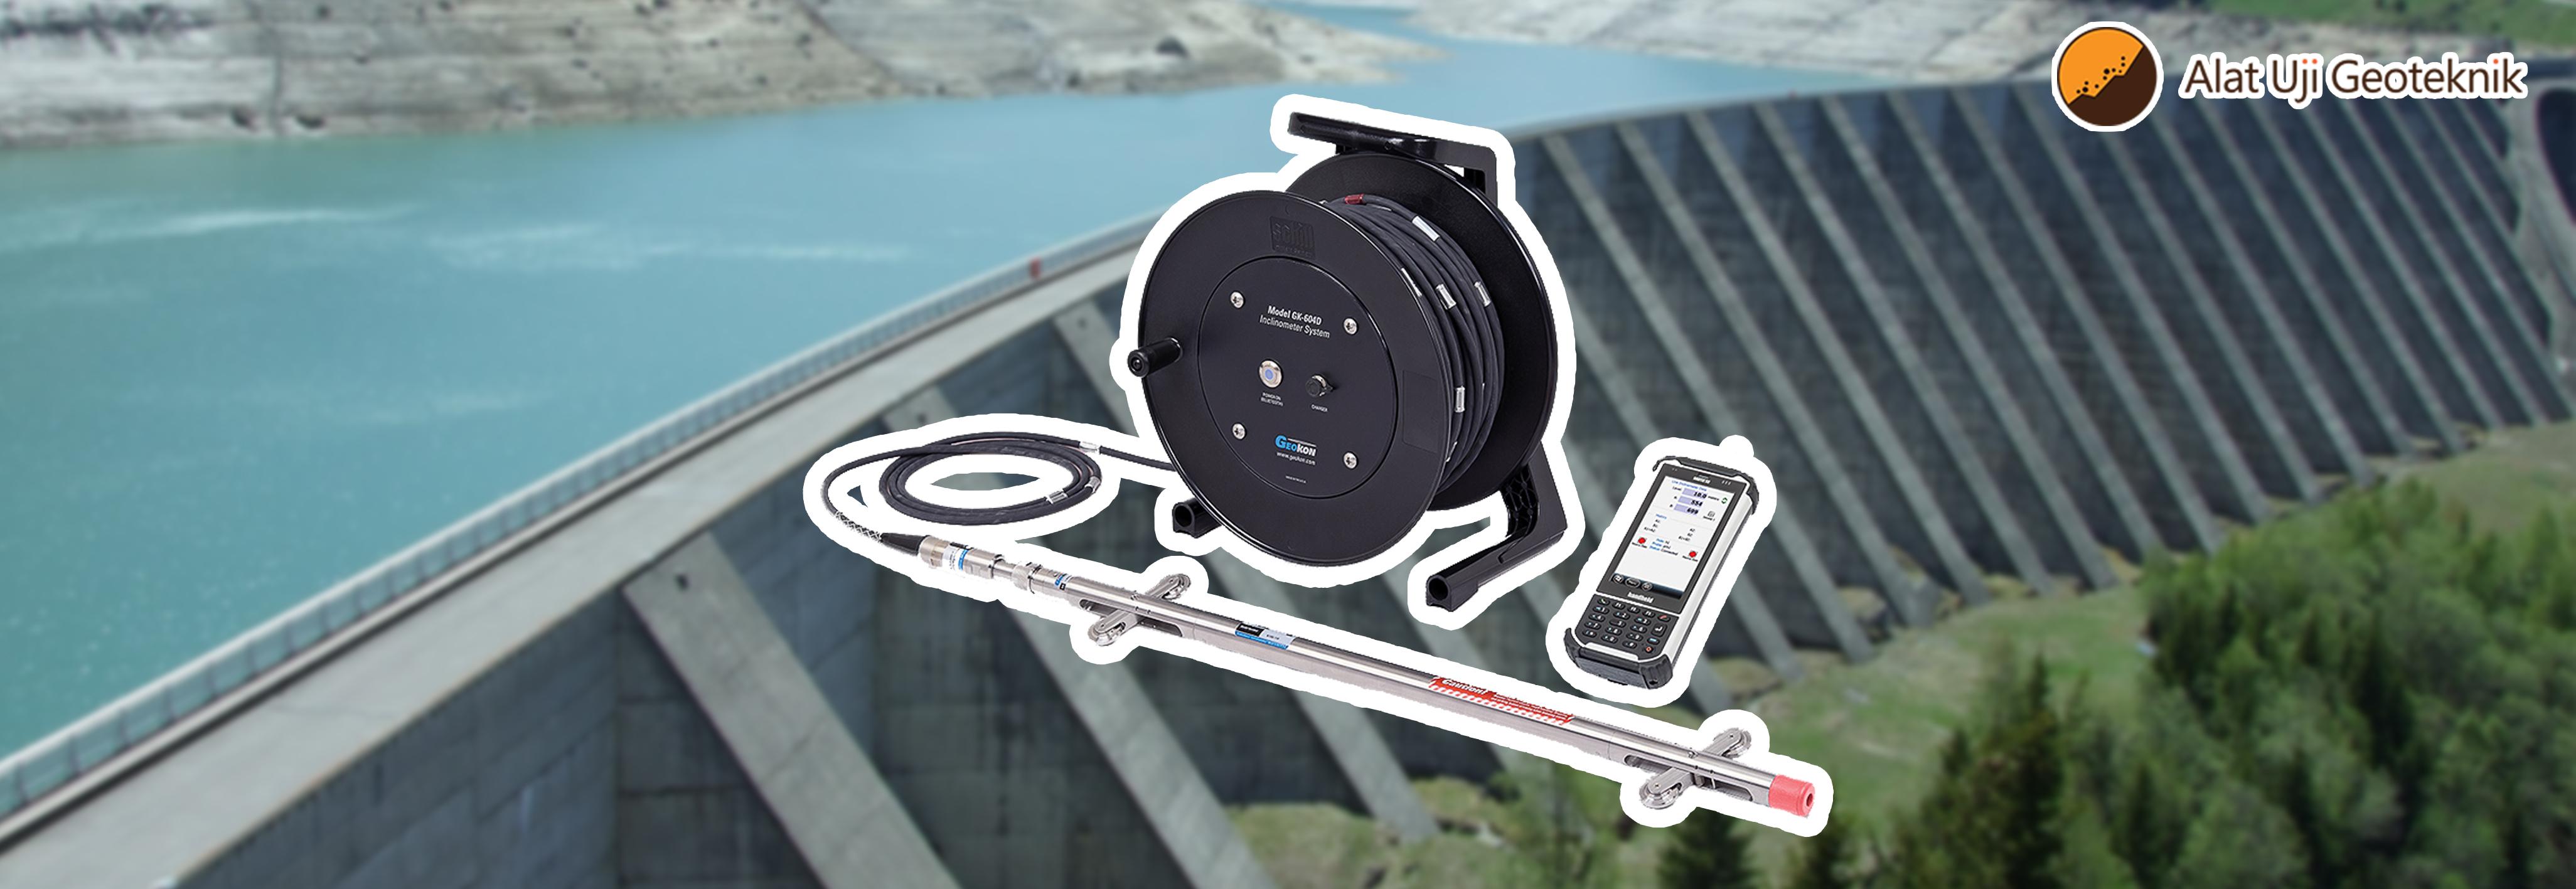 digital inclinometer system